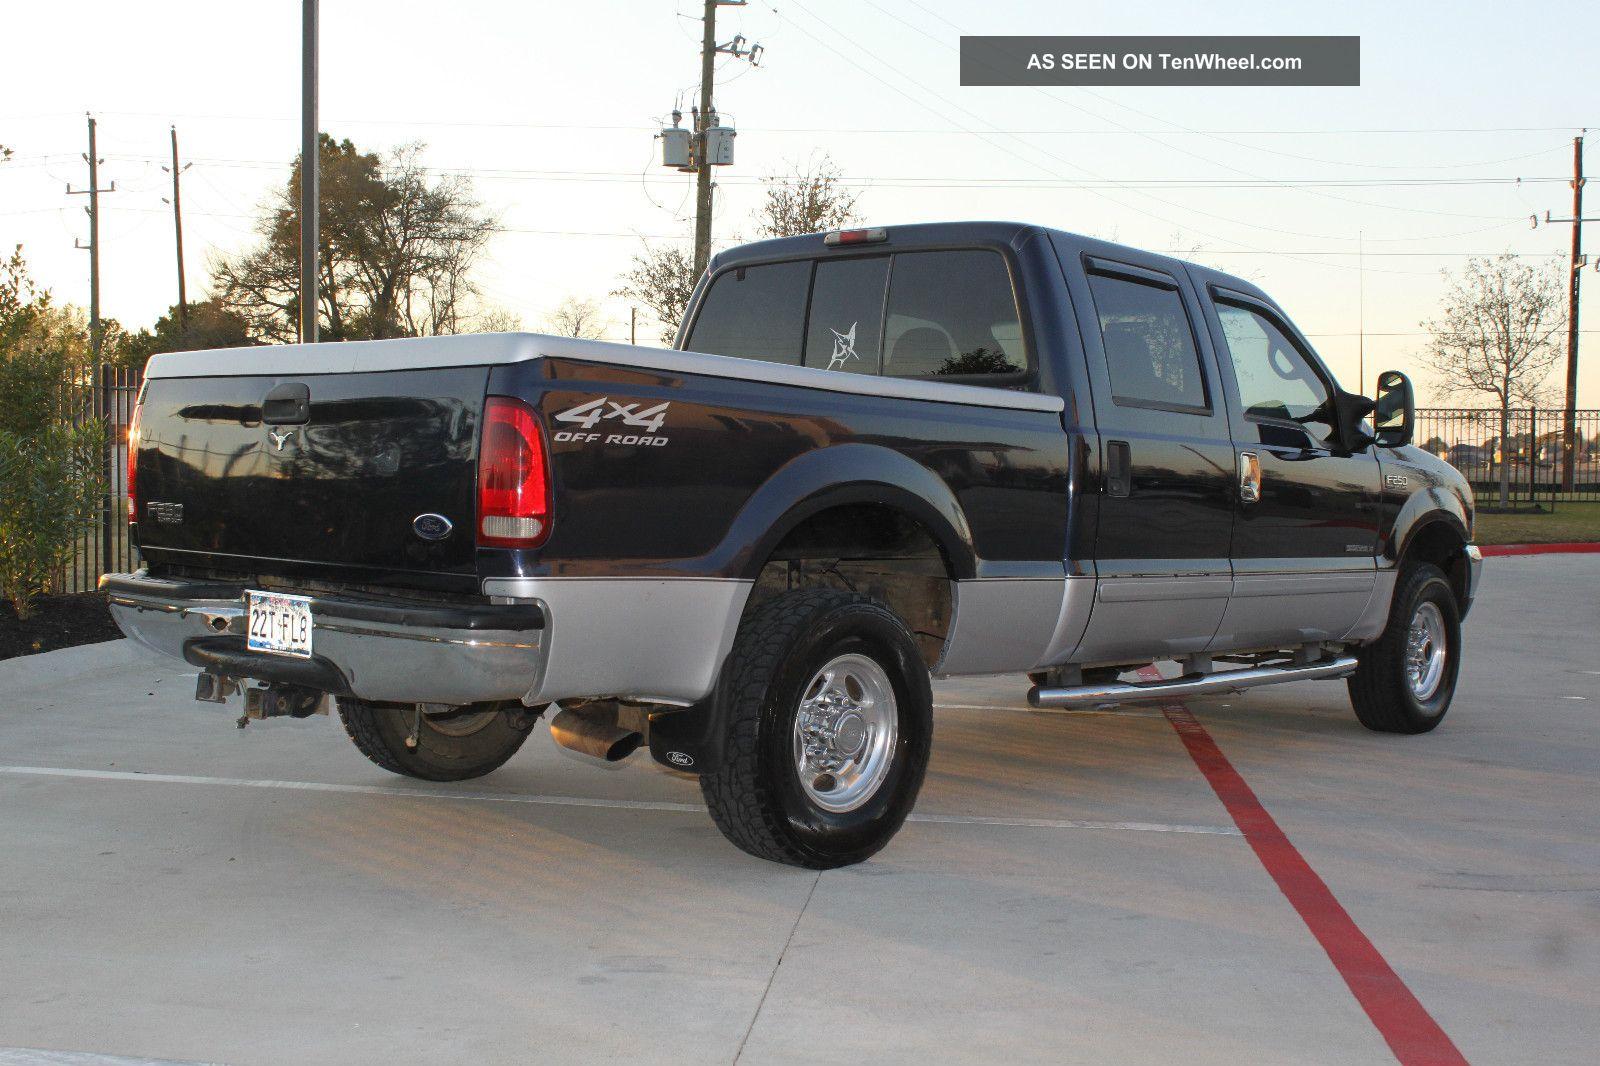 4X4 Trucks For Sale: Craigslist 4x4 Trucks For Sale